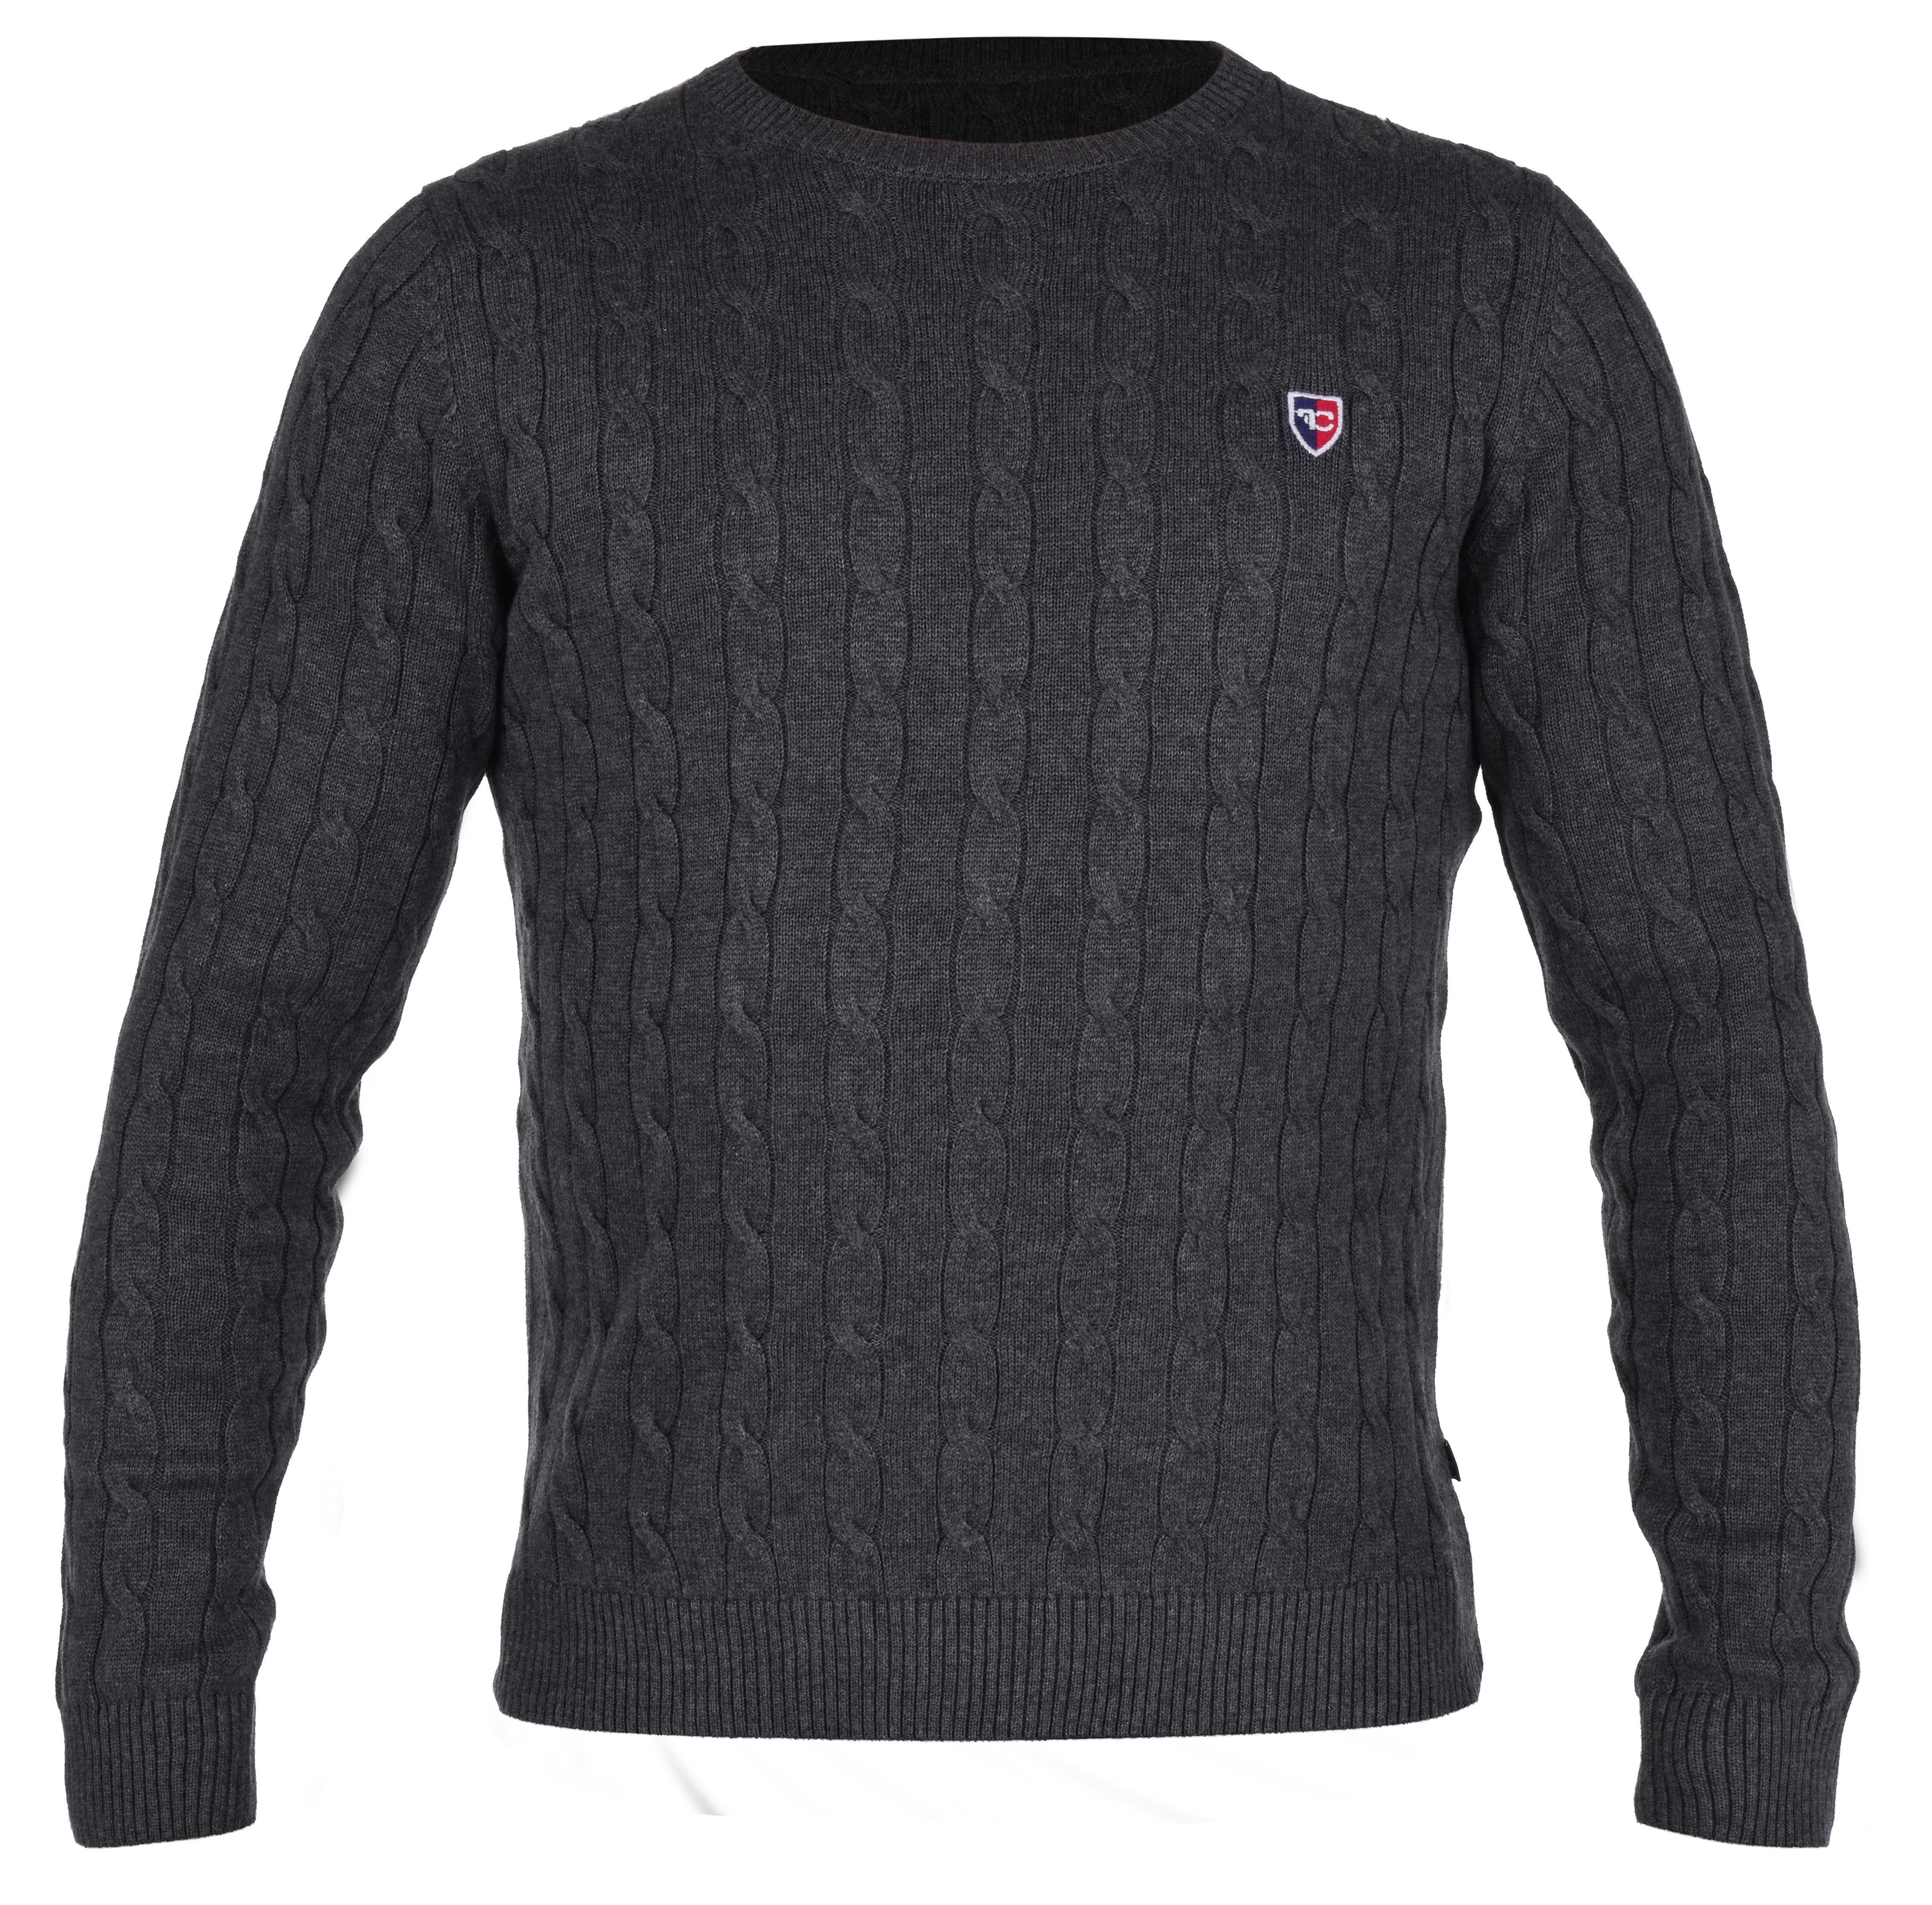 COTTON LÉGER pánský svetr šedá melange 1(M)